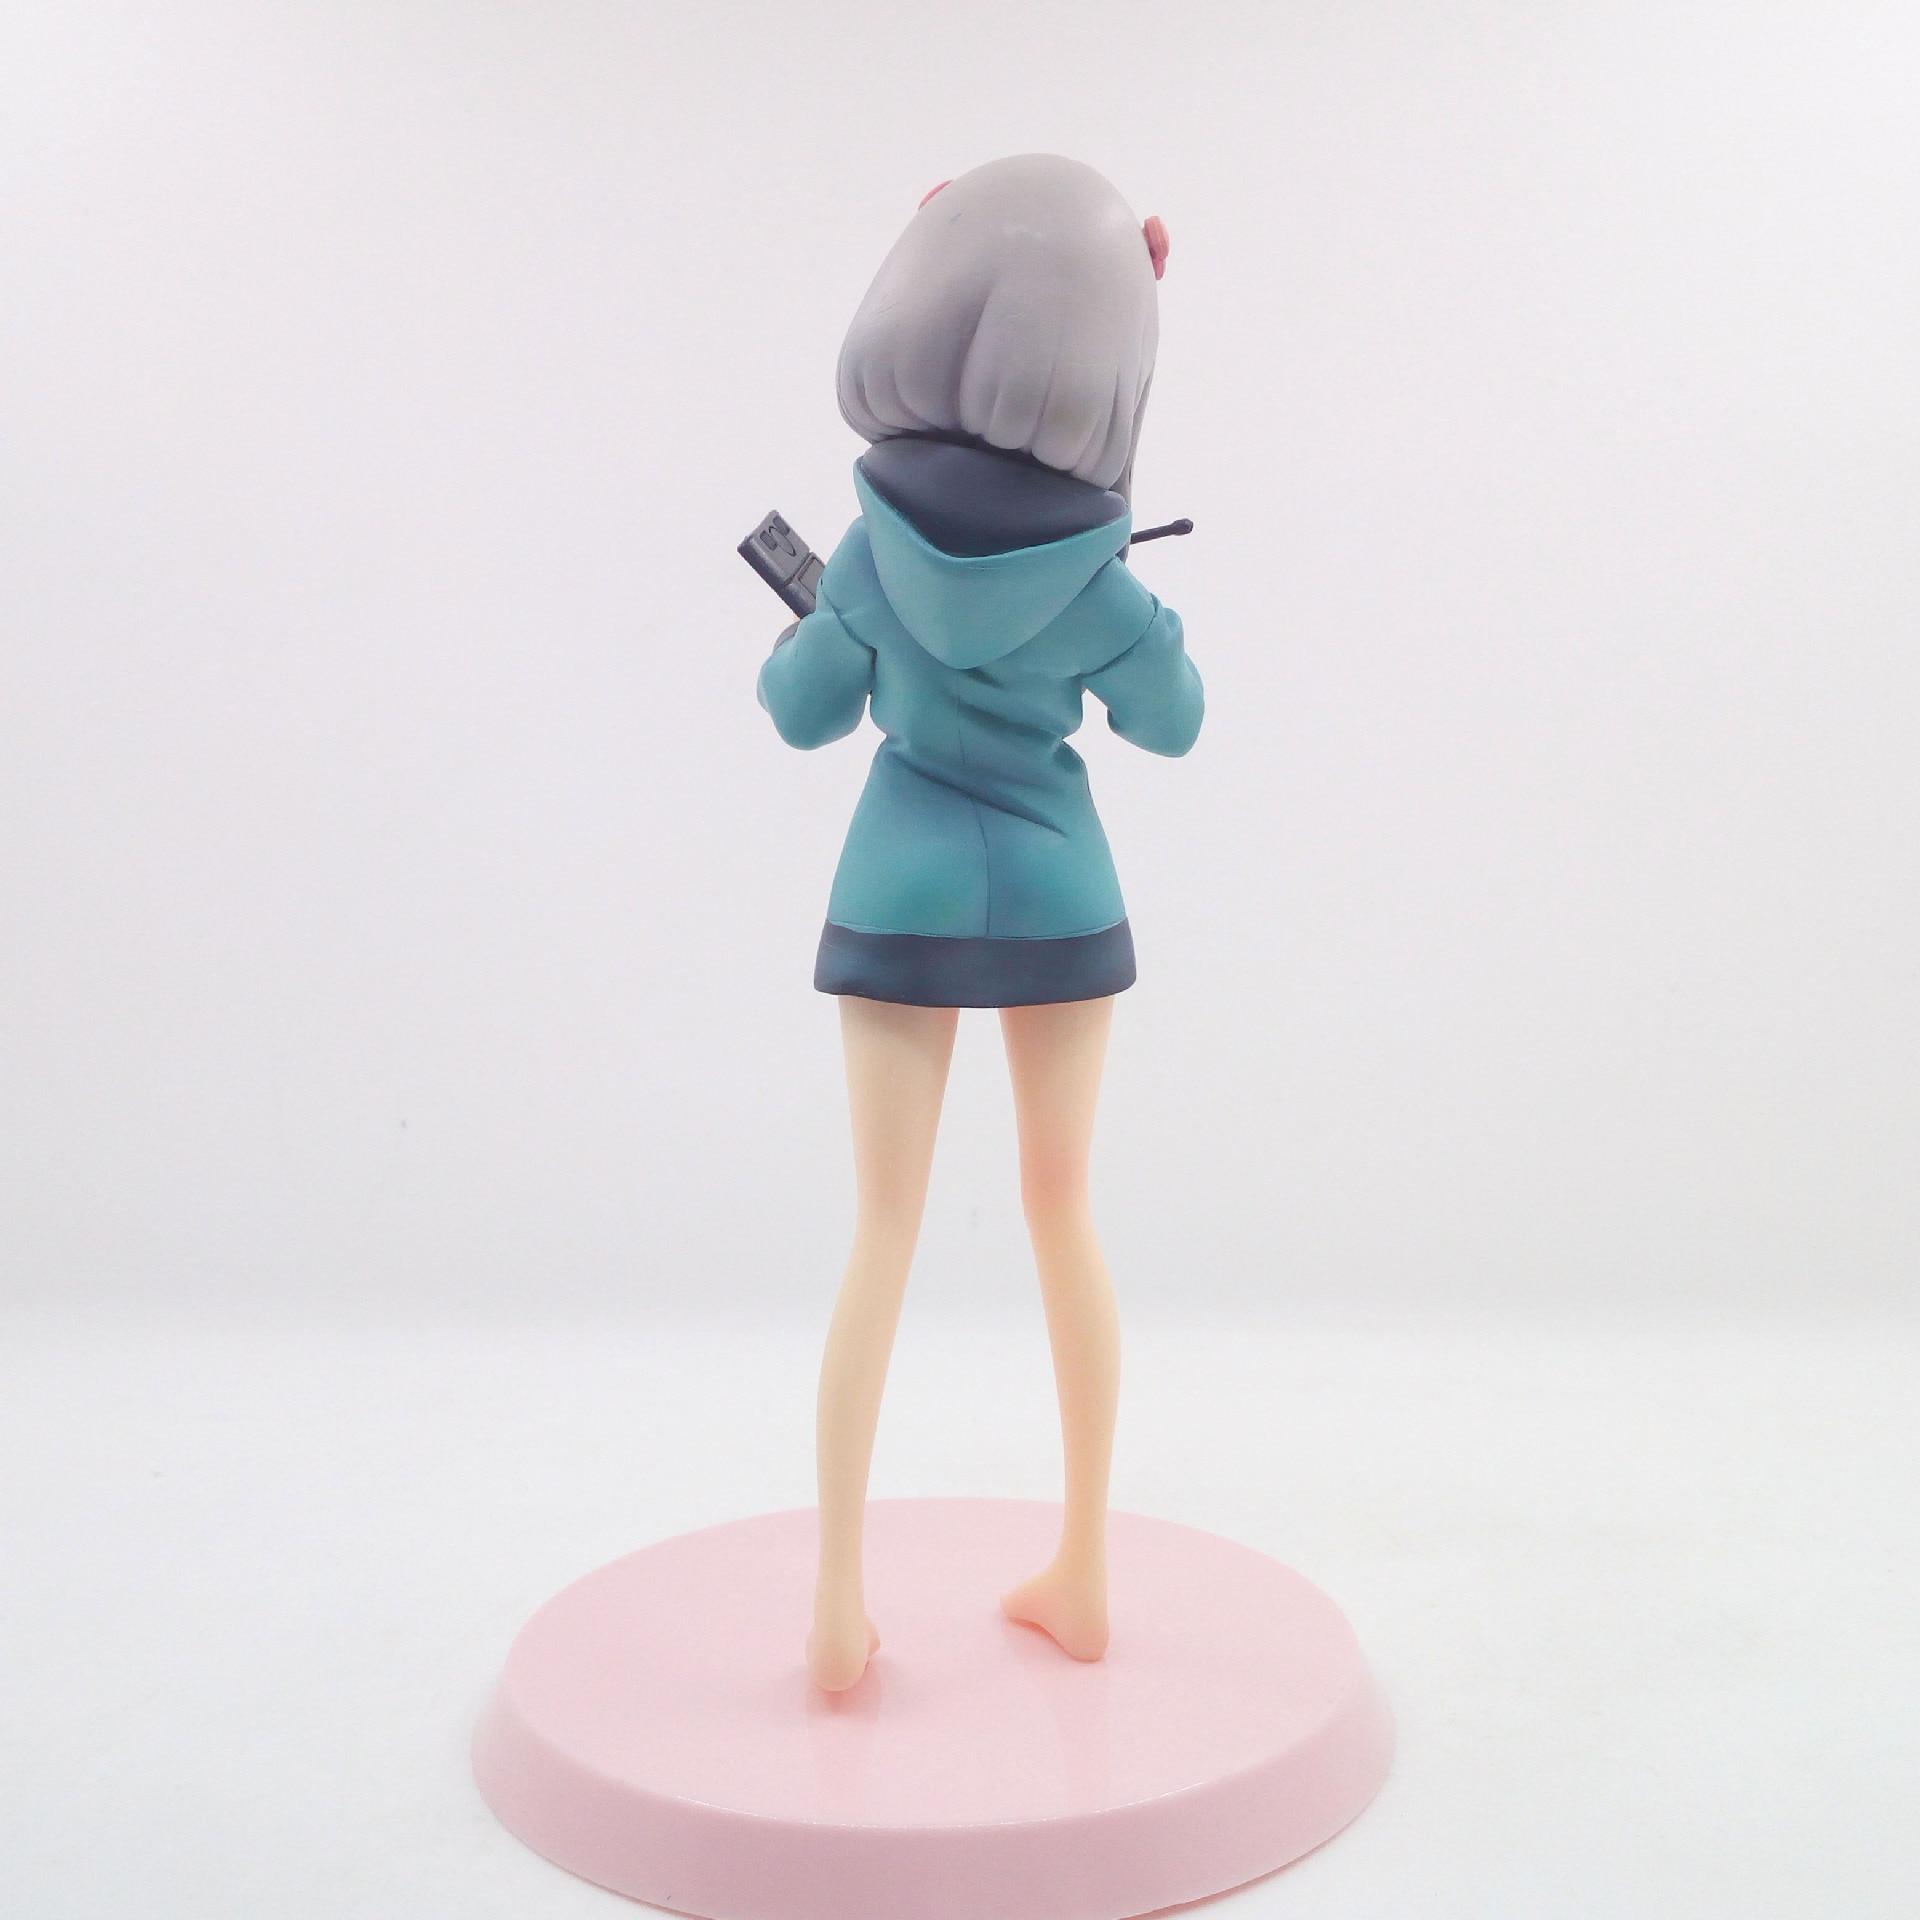 Izumi Sagiri Masamune Izumi Sexy Anime Action Figure Pvc New Collection Figures Toys Collection For Christmas Gift 1